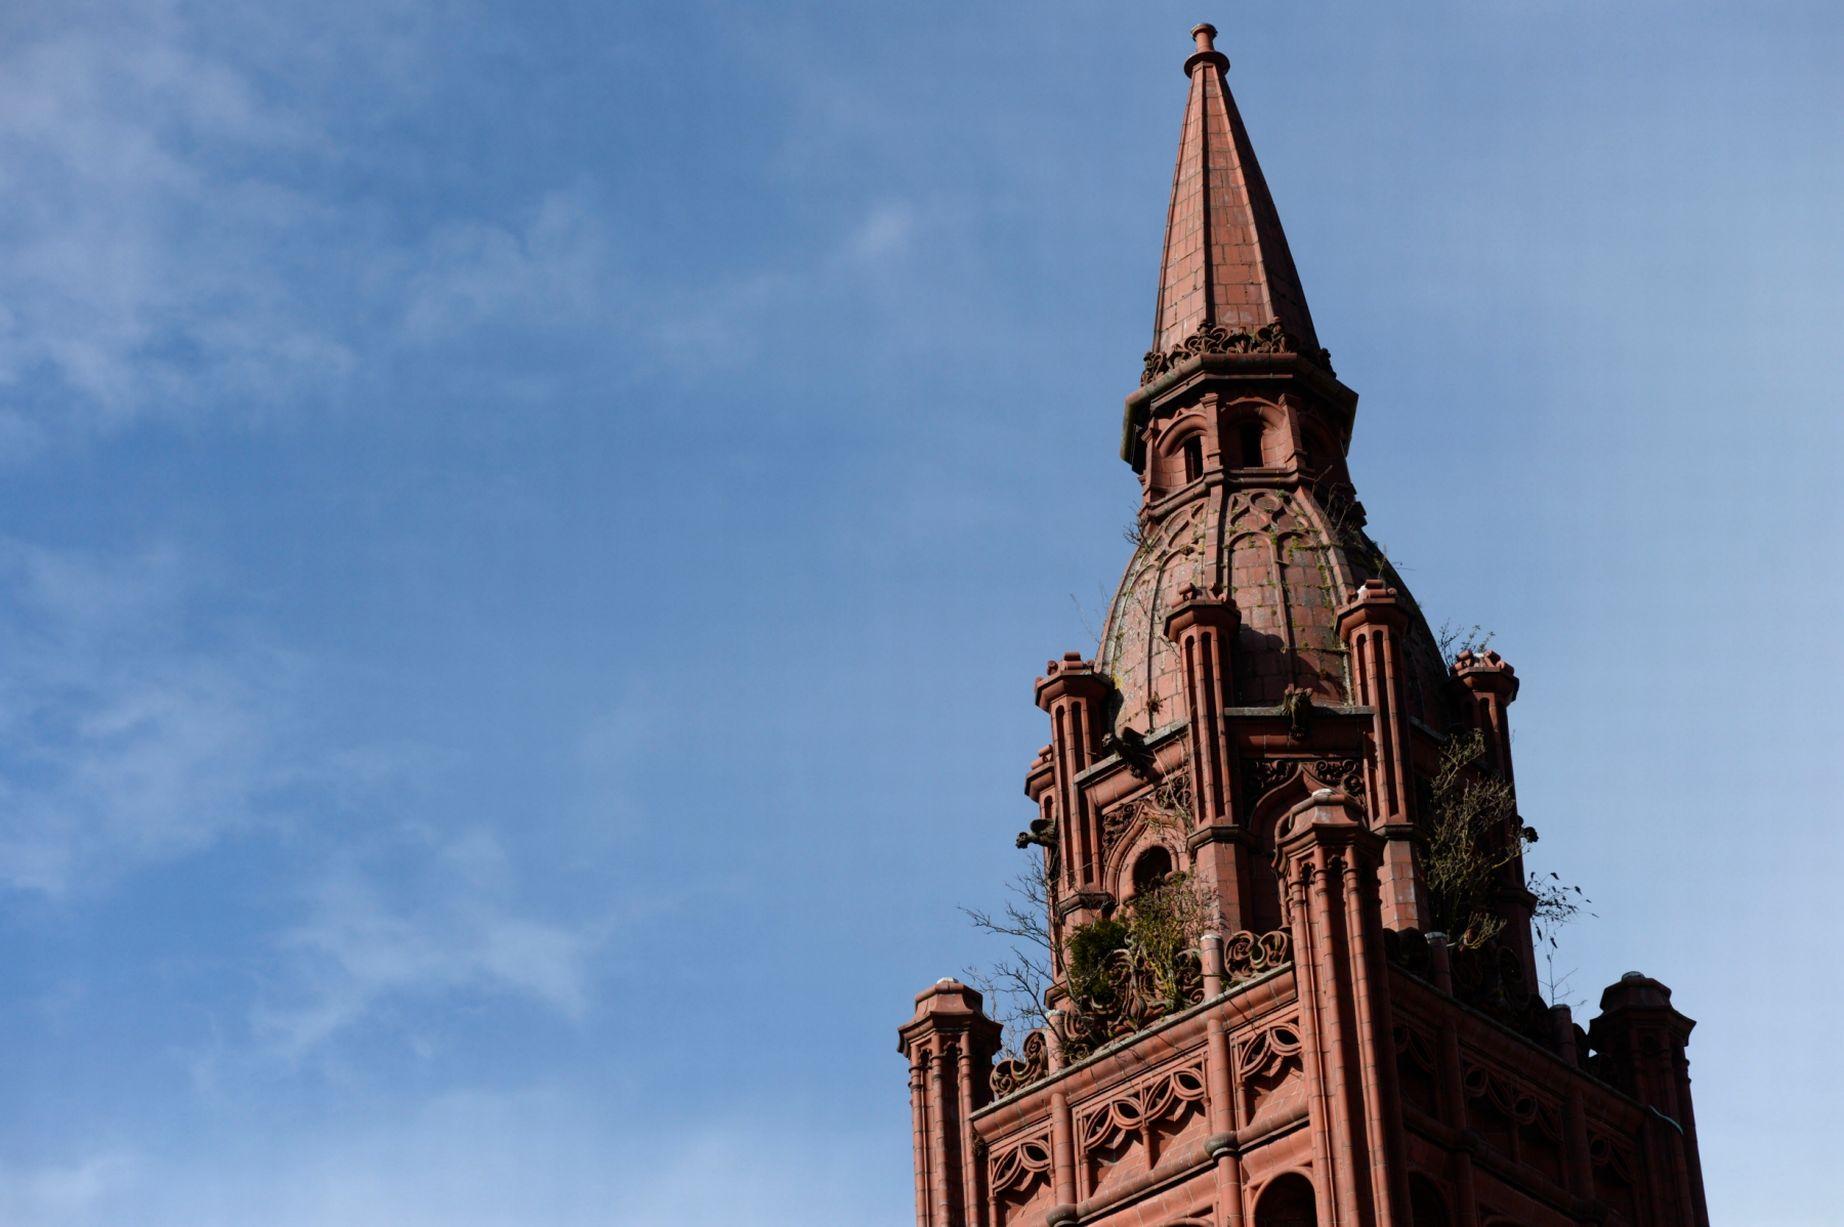 The Central Hall Spire Birmingham